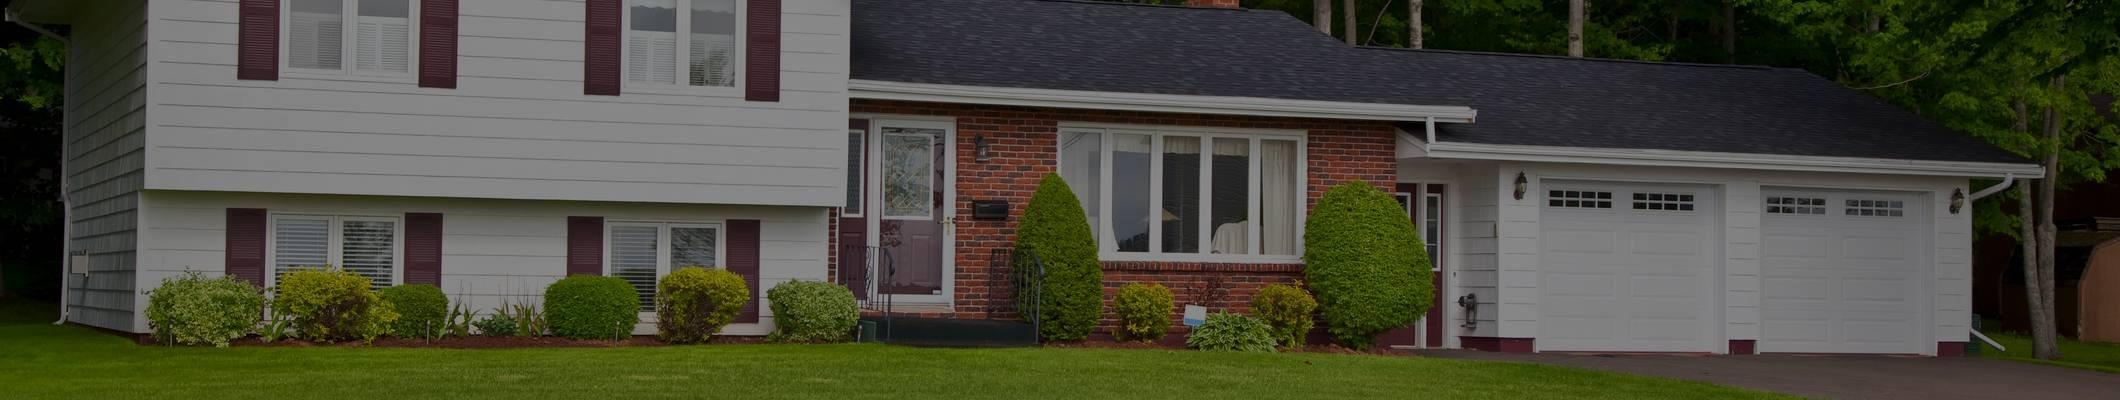 Estimate the rebuild cost a side split or back split house